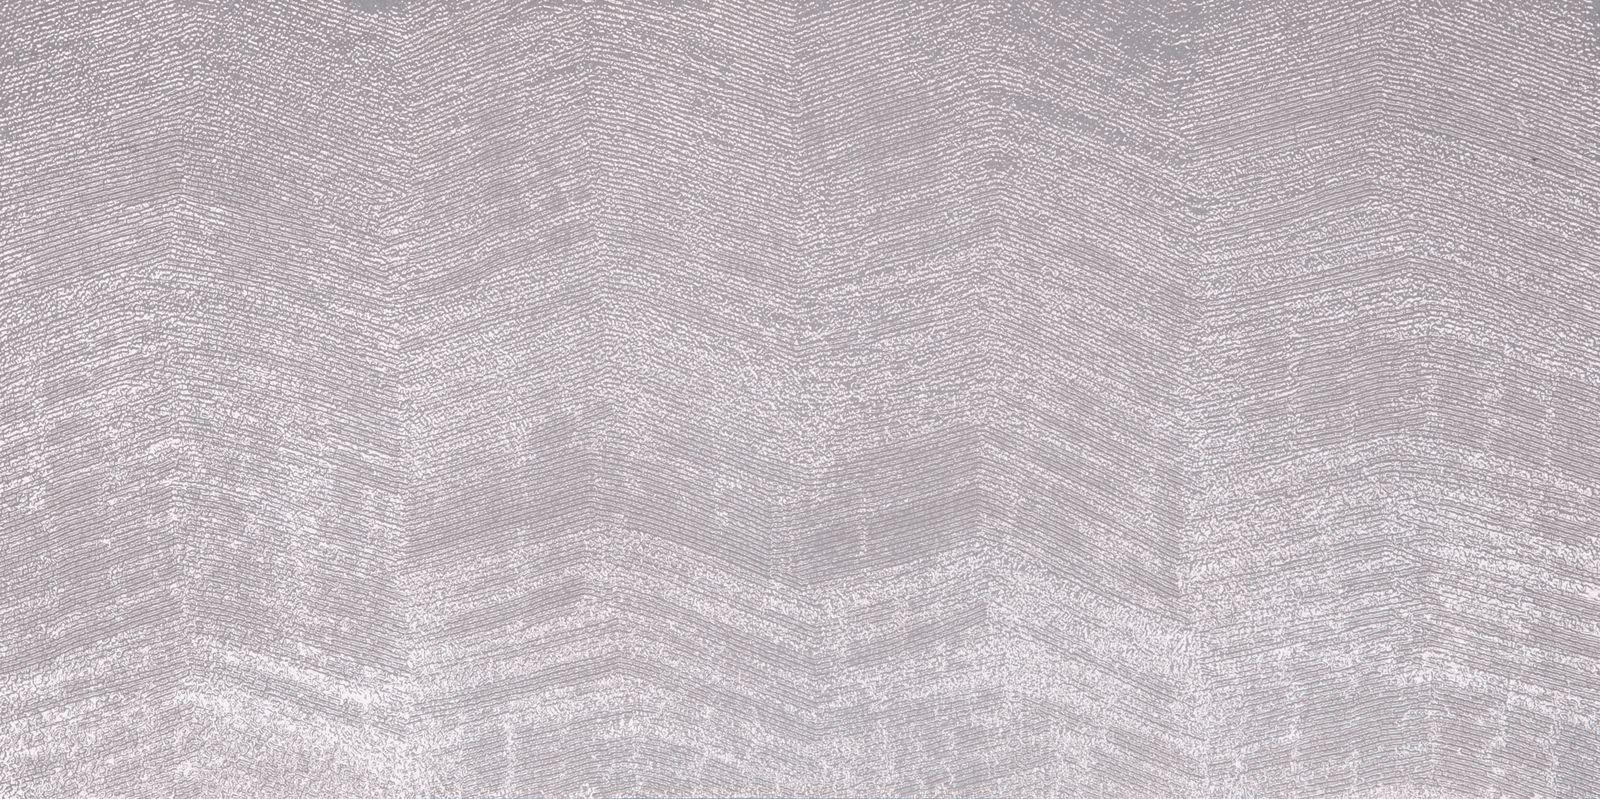 Silver (znxsw8r) изображение 2